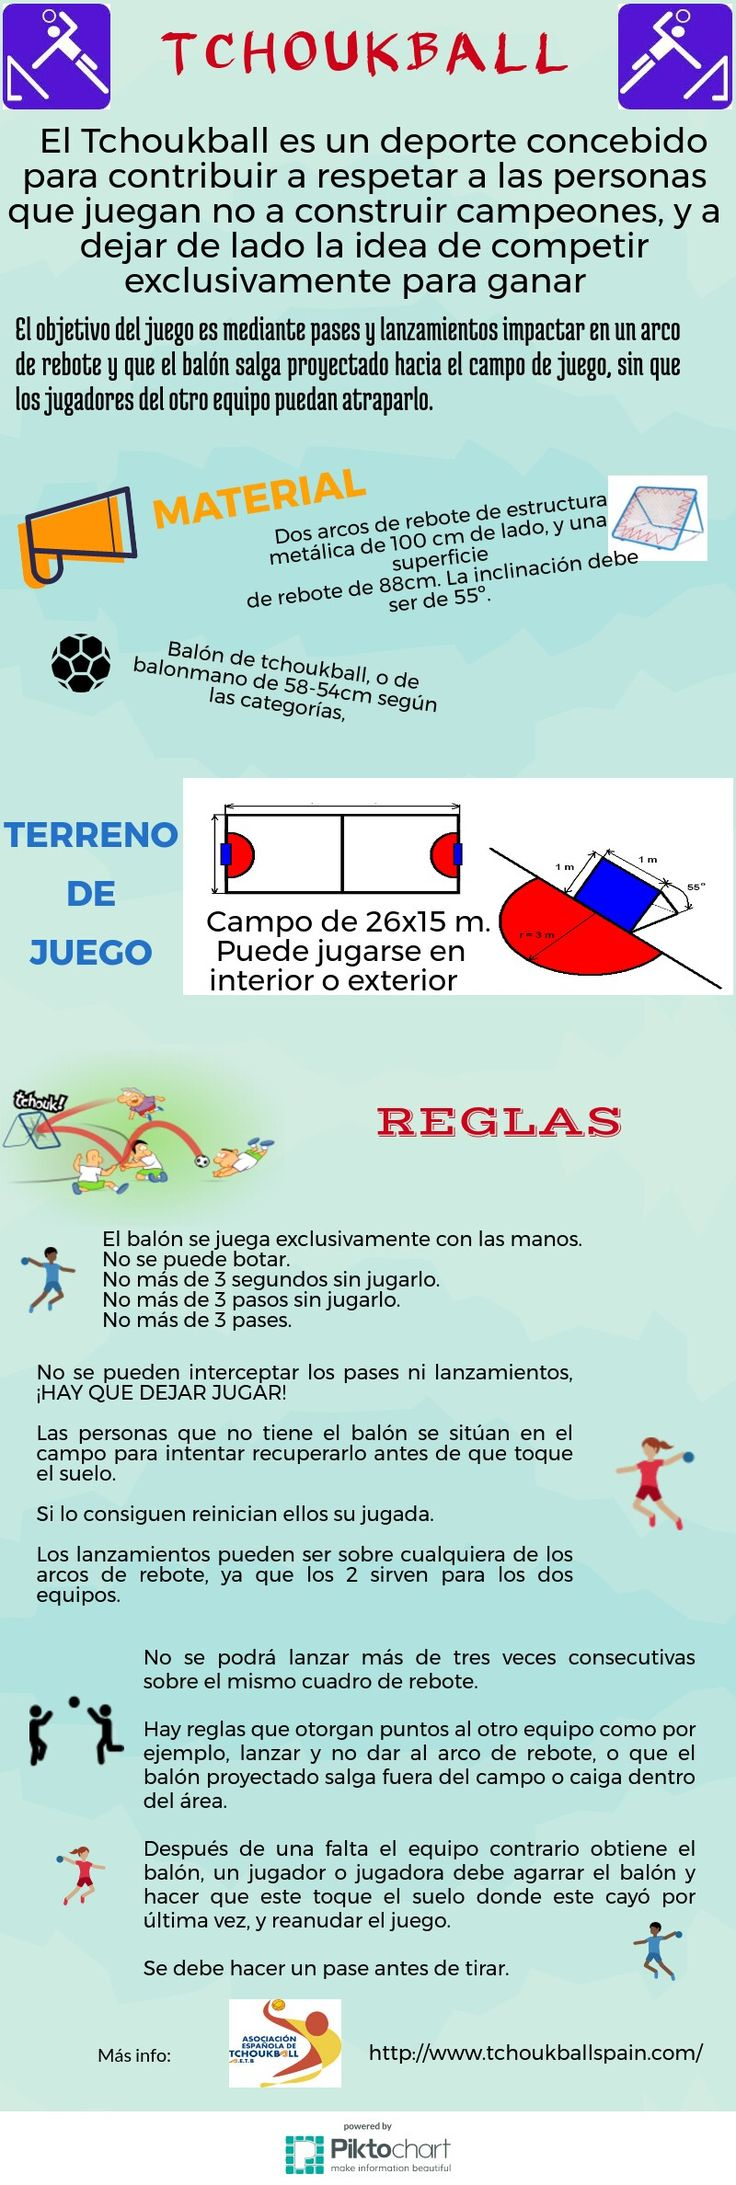 Tchoukball. Reglas del un deporte diferente. | infografias propias ...